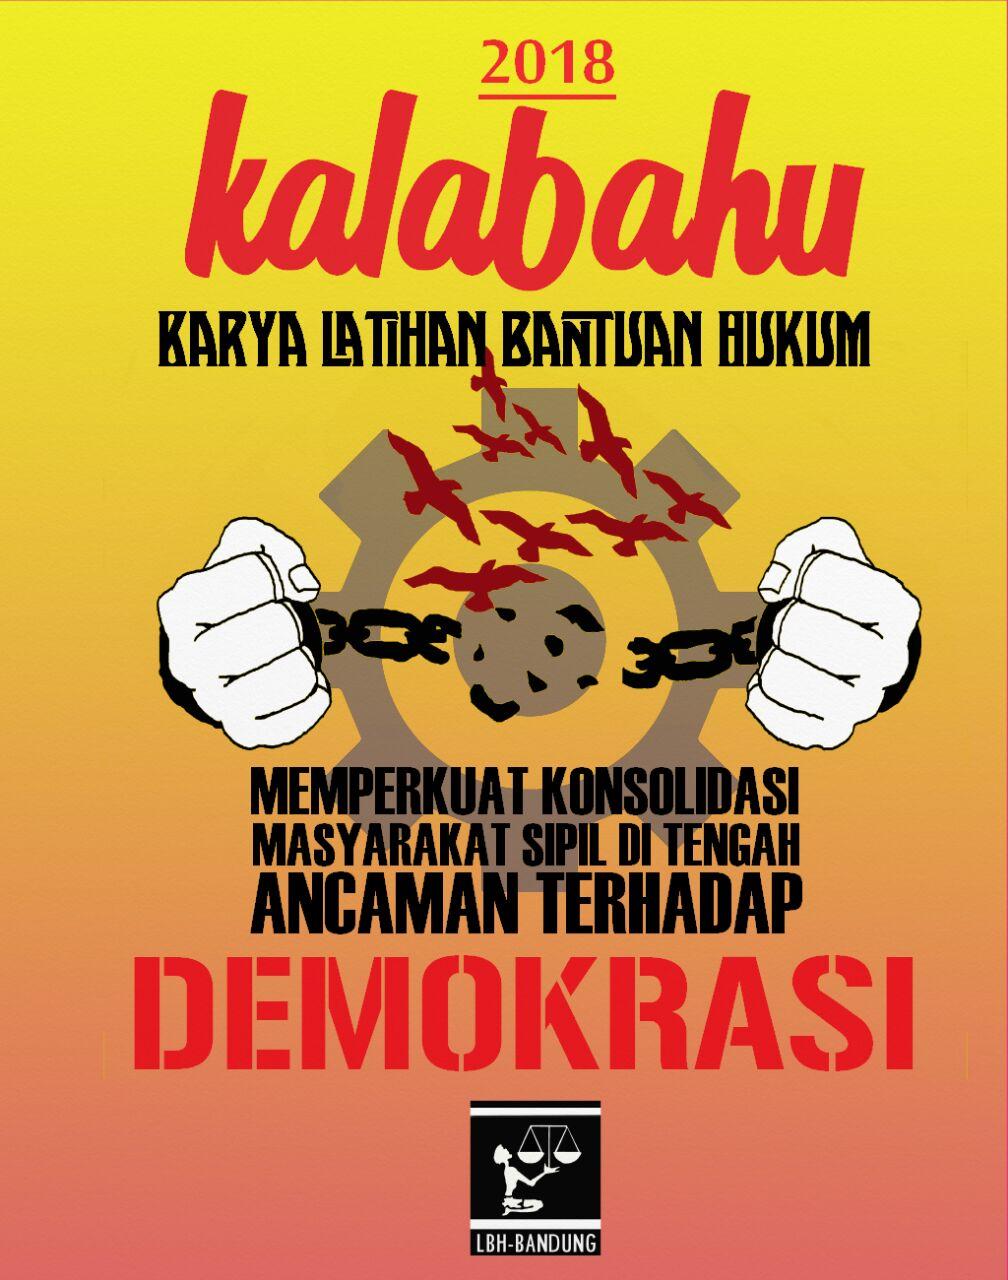 Hore! Pendaftaran KALABAHU 2018 LBH Bandung Resmi Dibuka